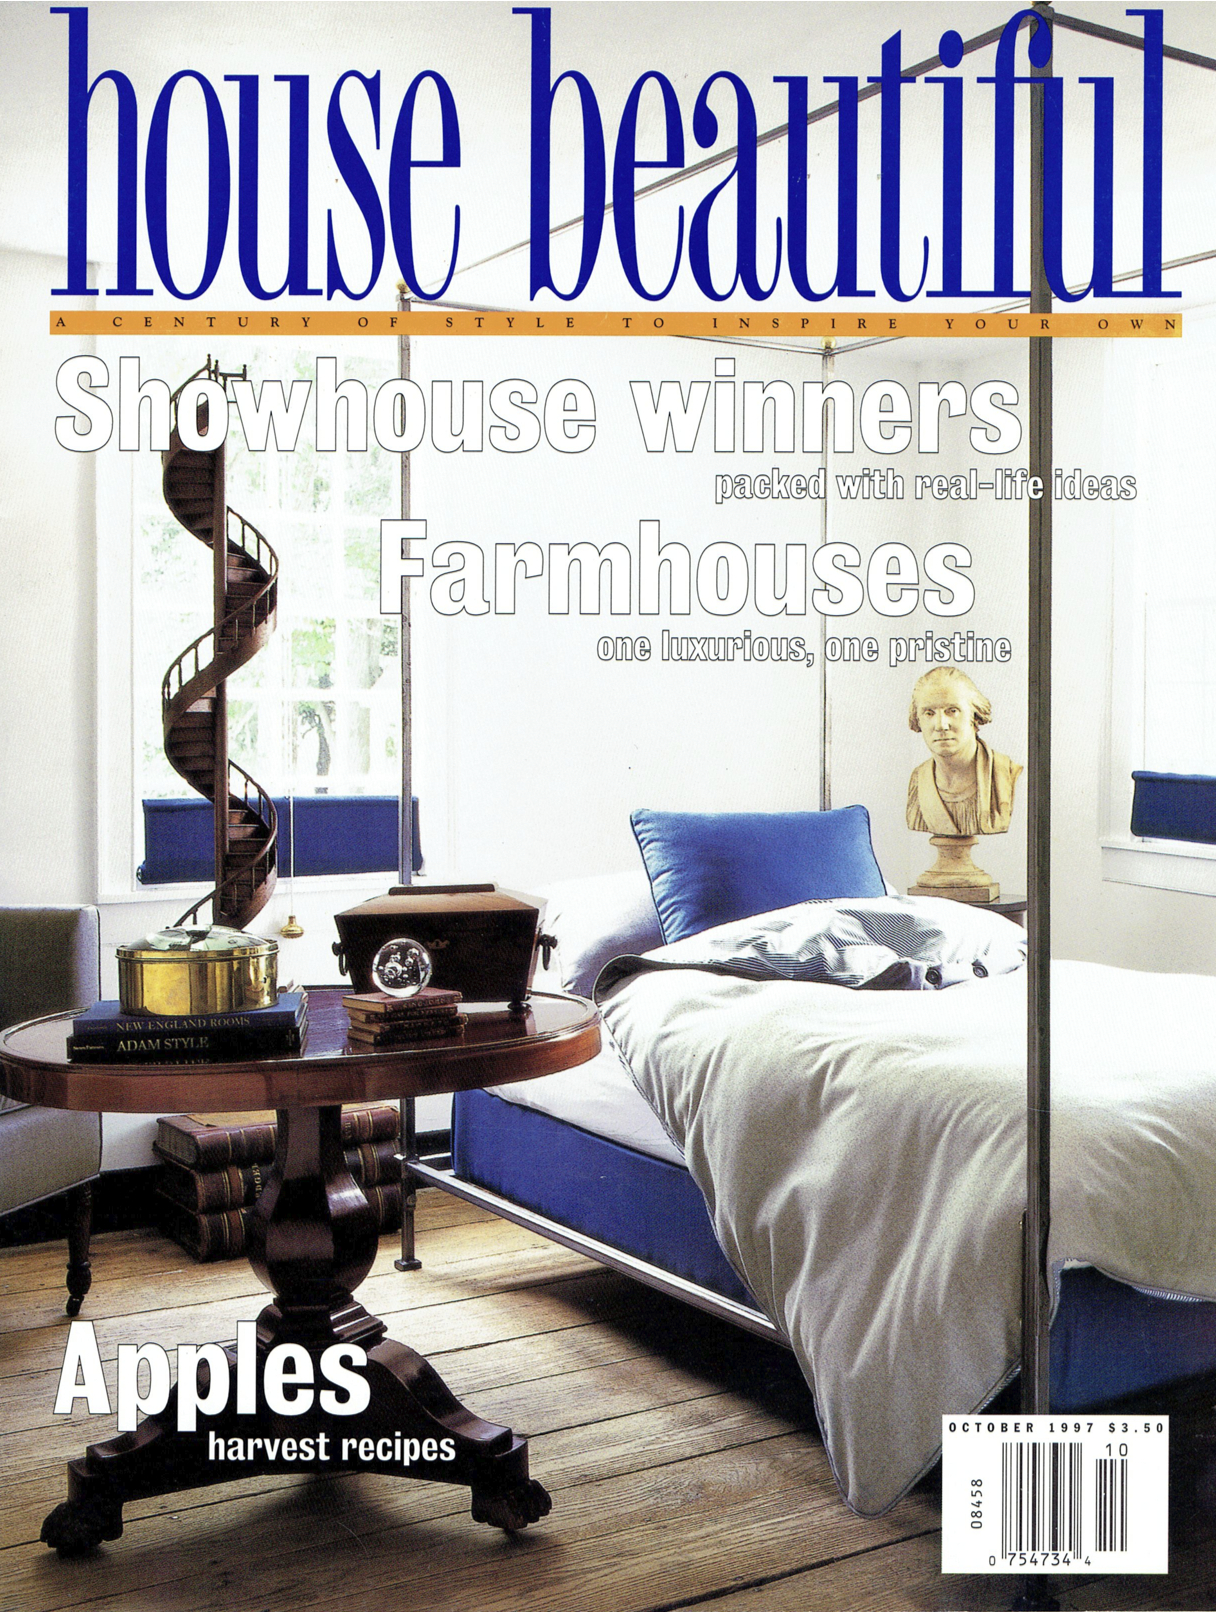 House Beautiful Cover.jpg